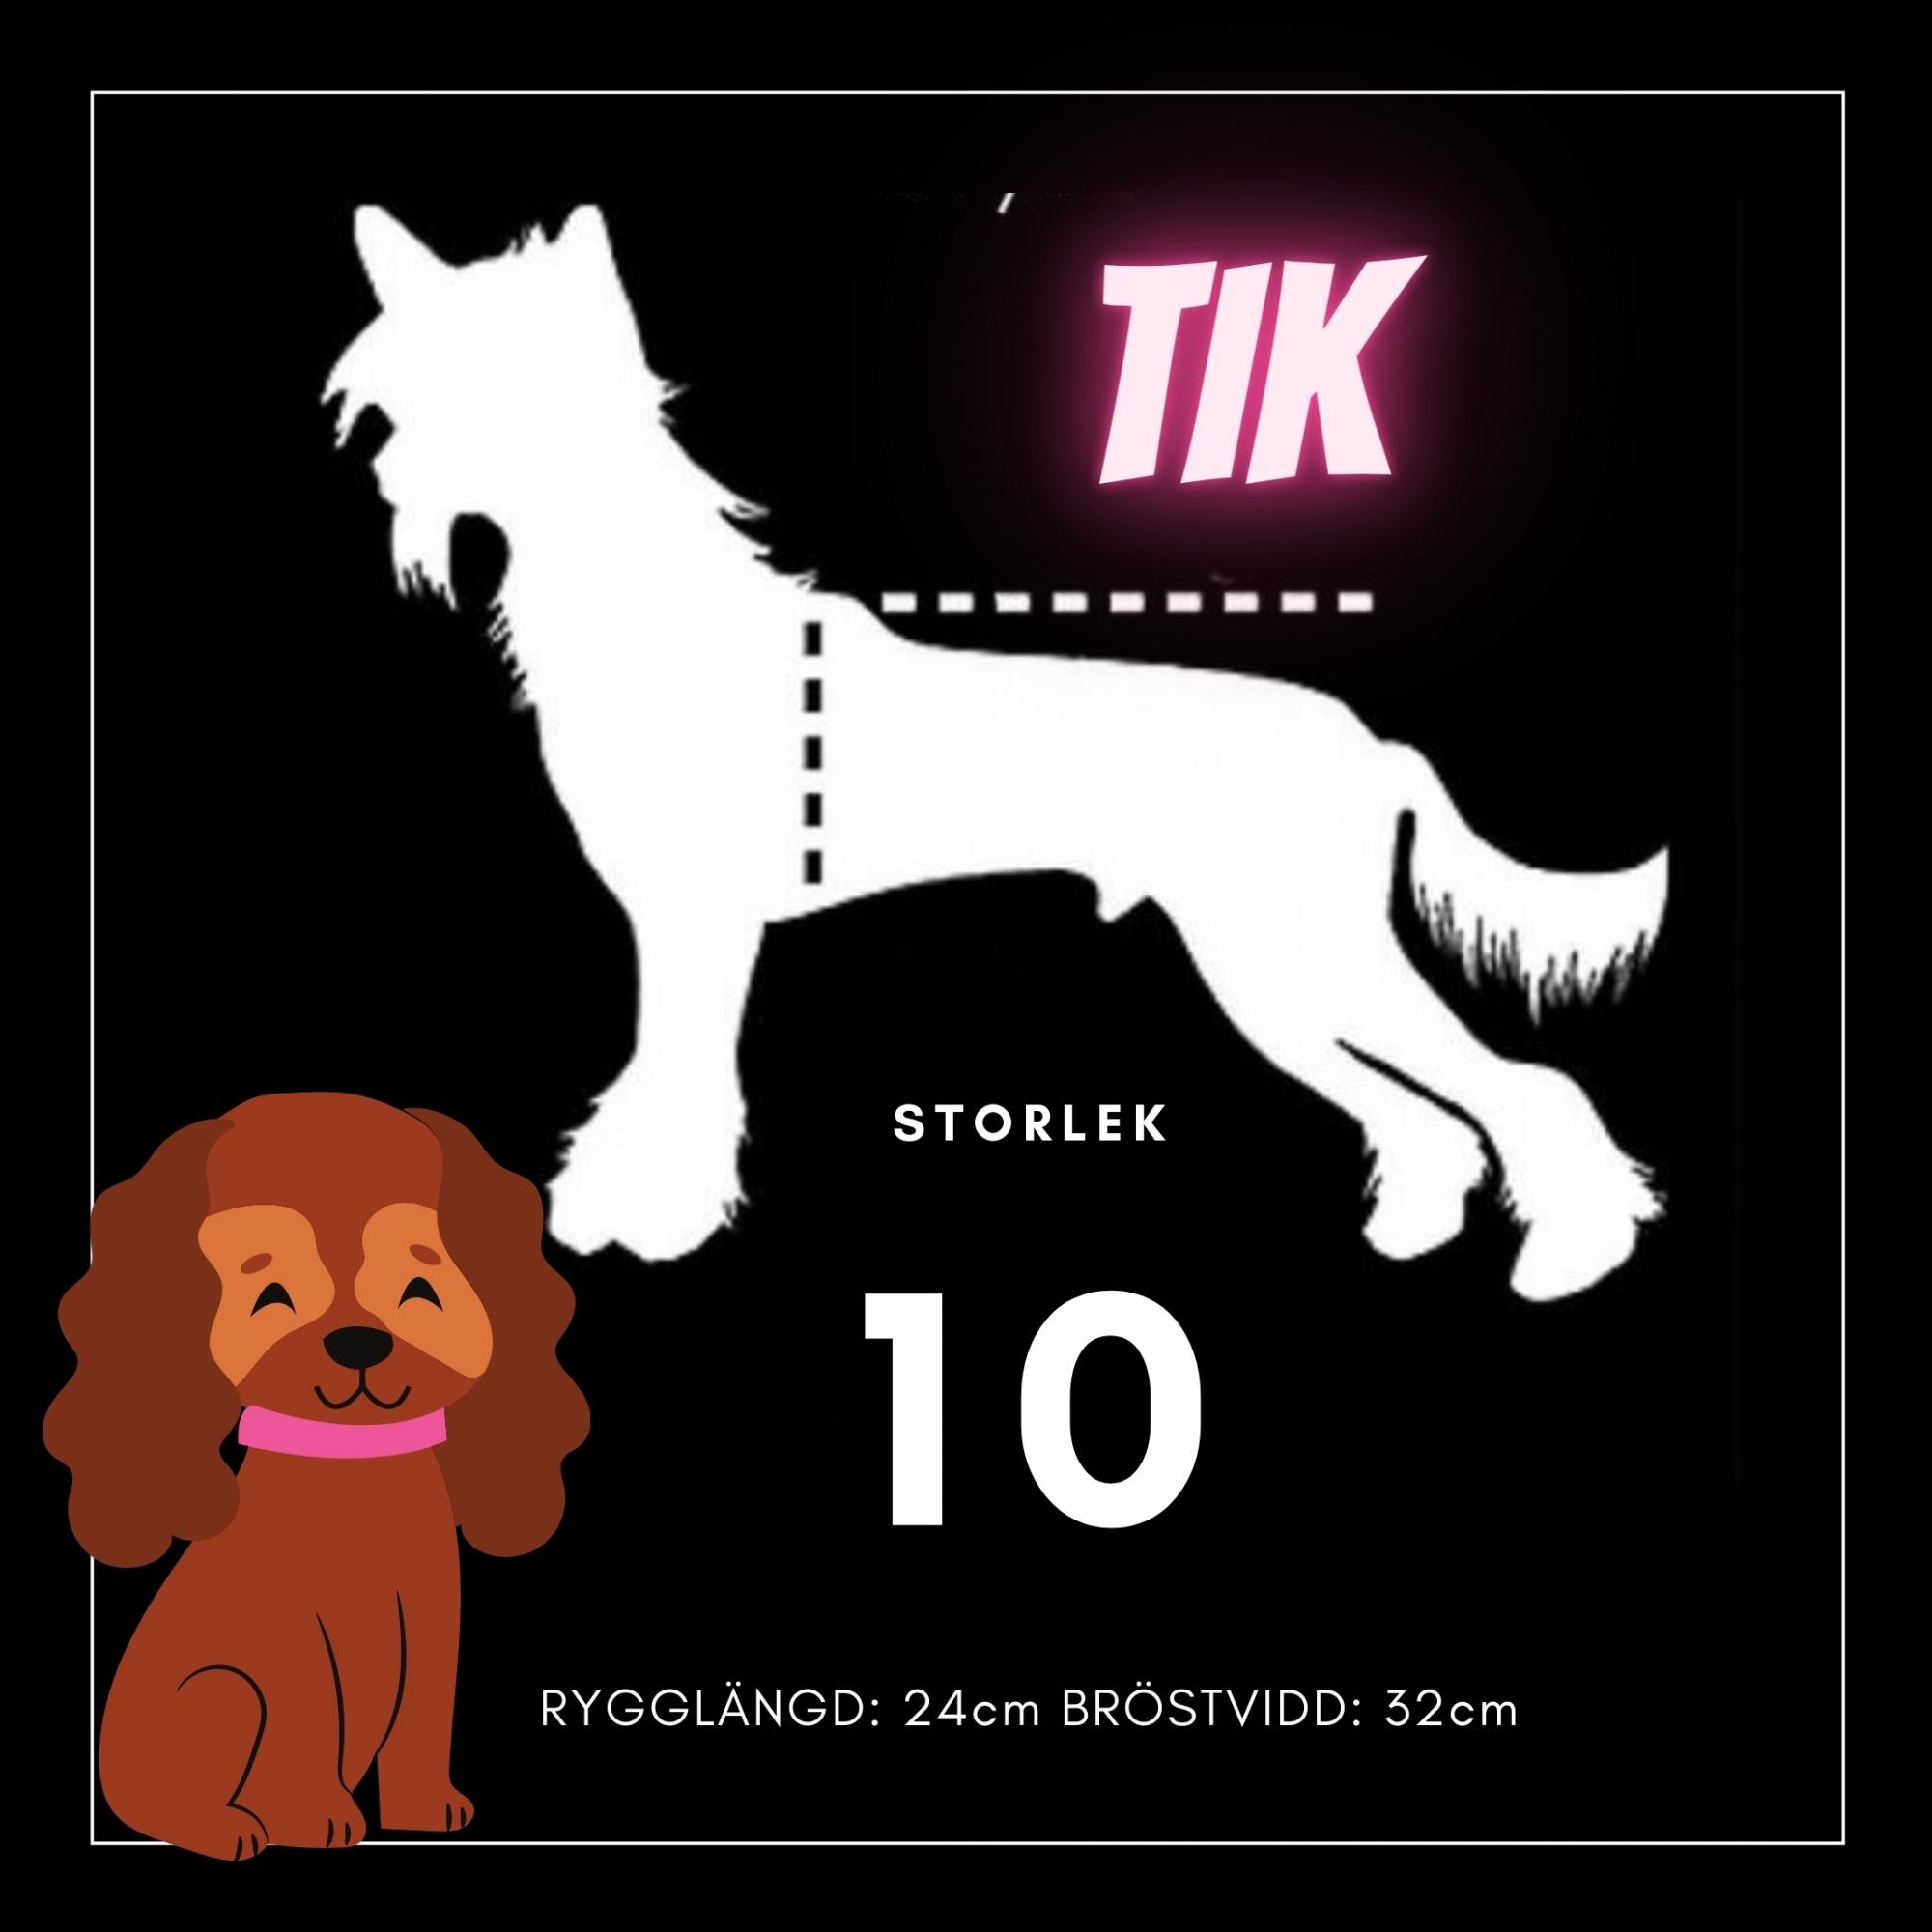 Tik Storlek 10 - Passion For Pet Fashion